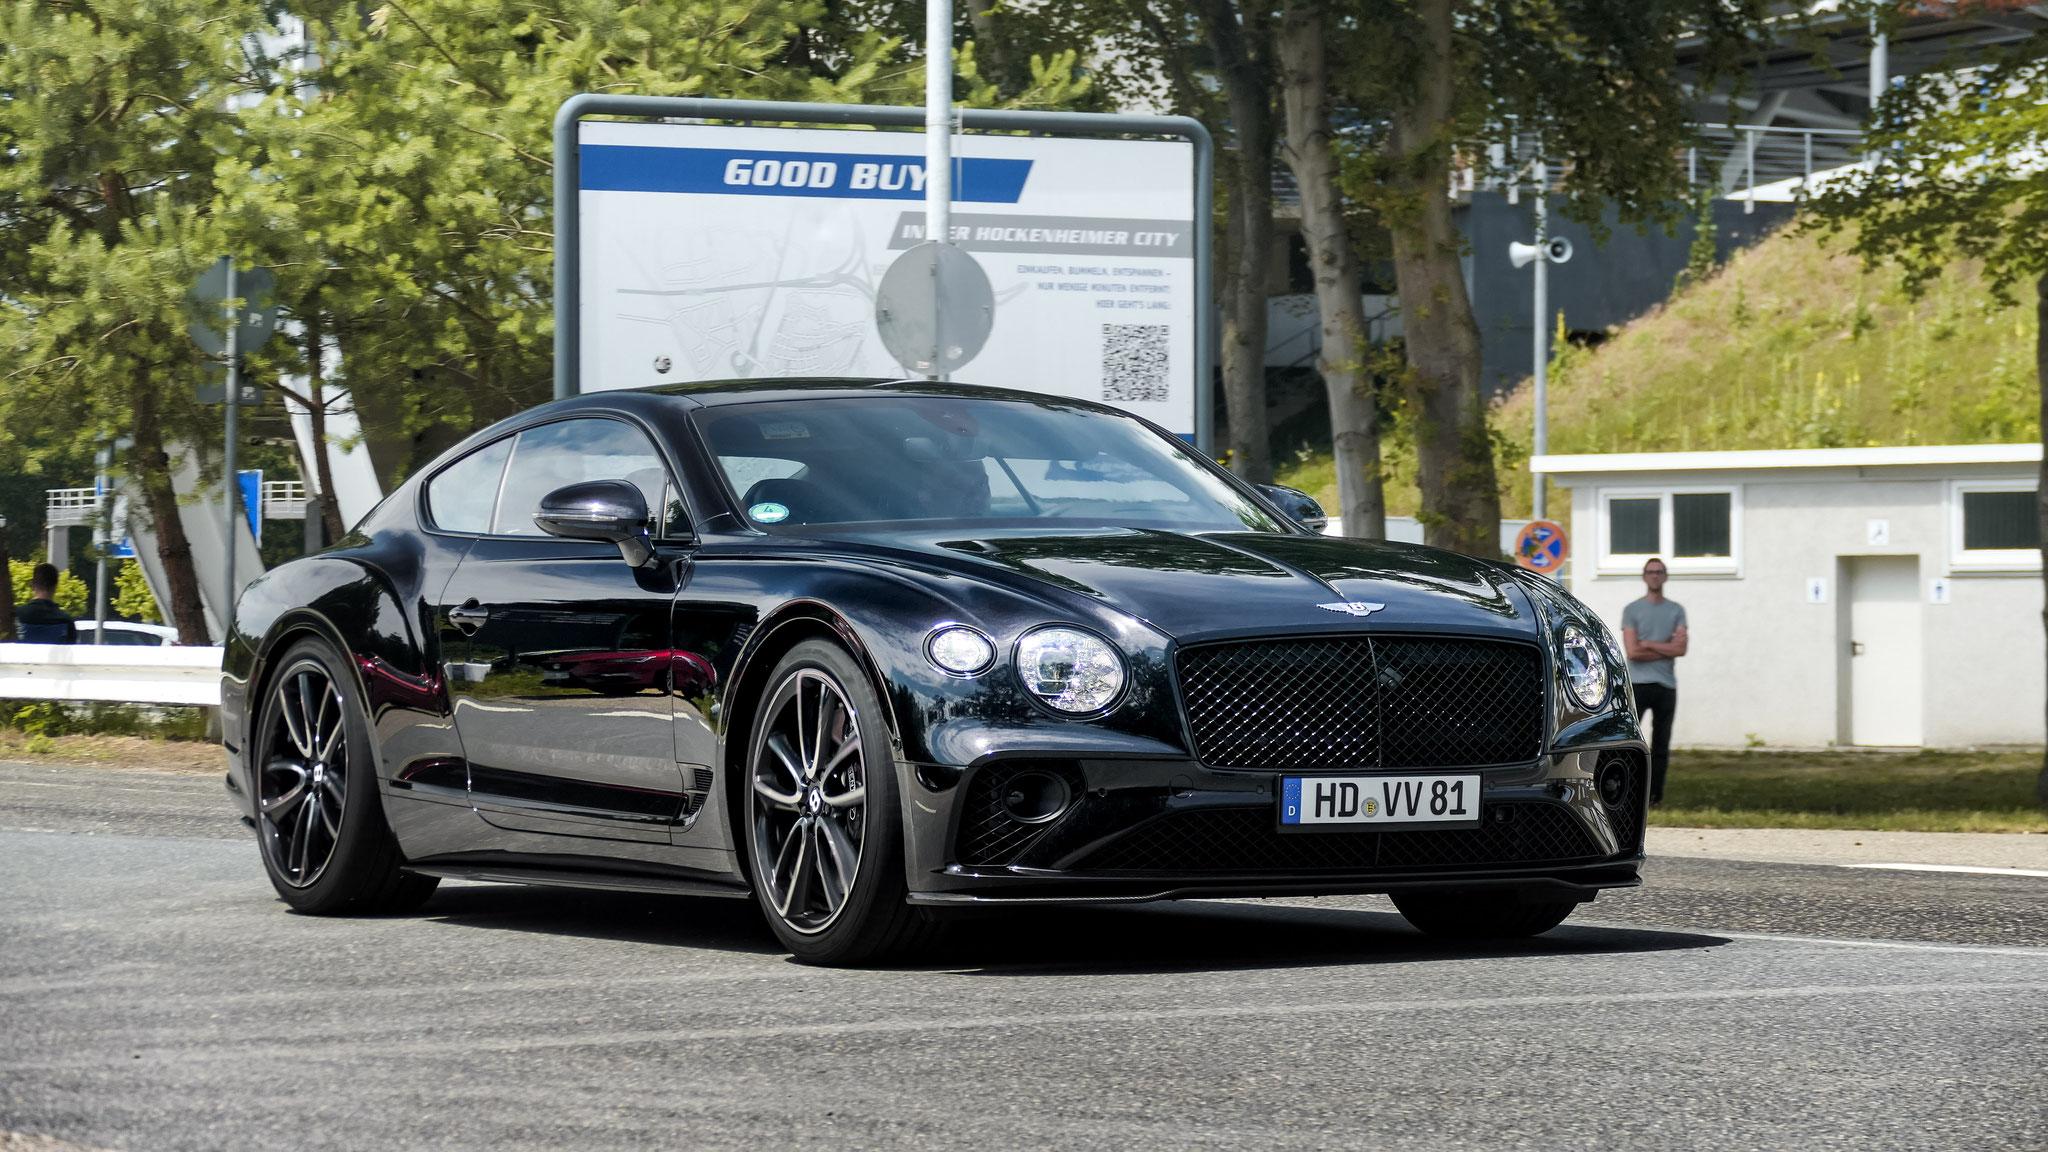 Bentley Continental GT - HD-VV-81